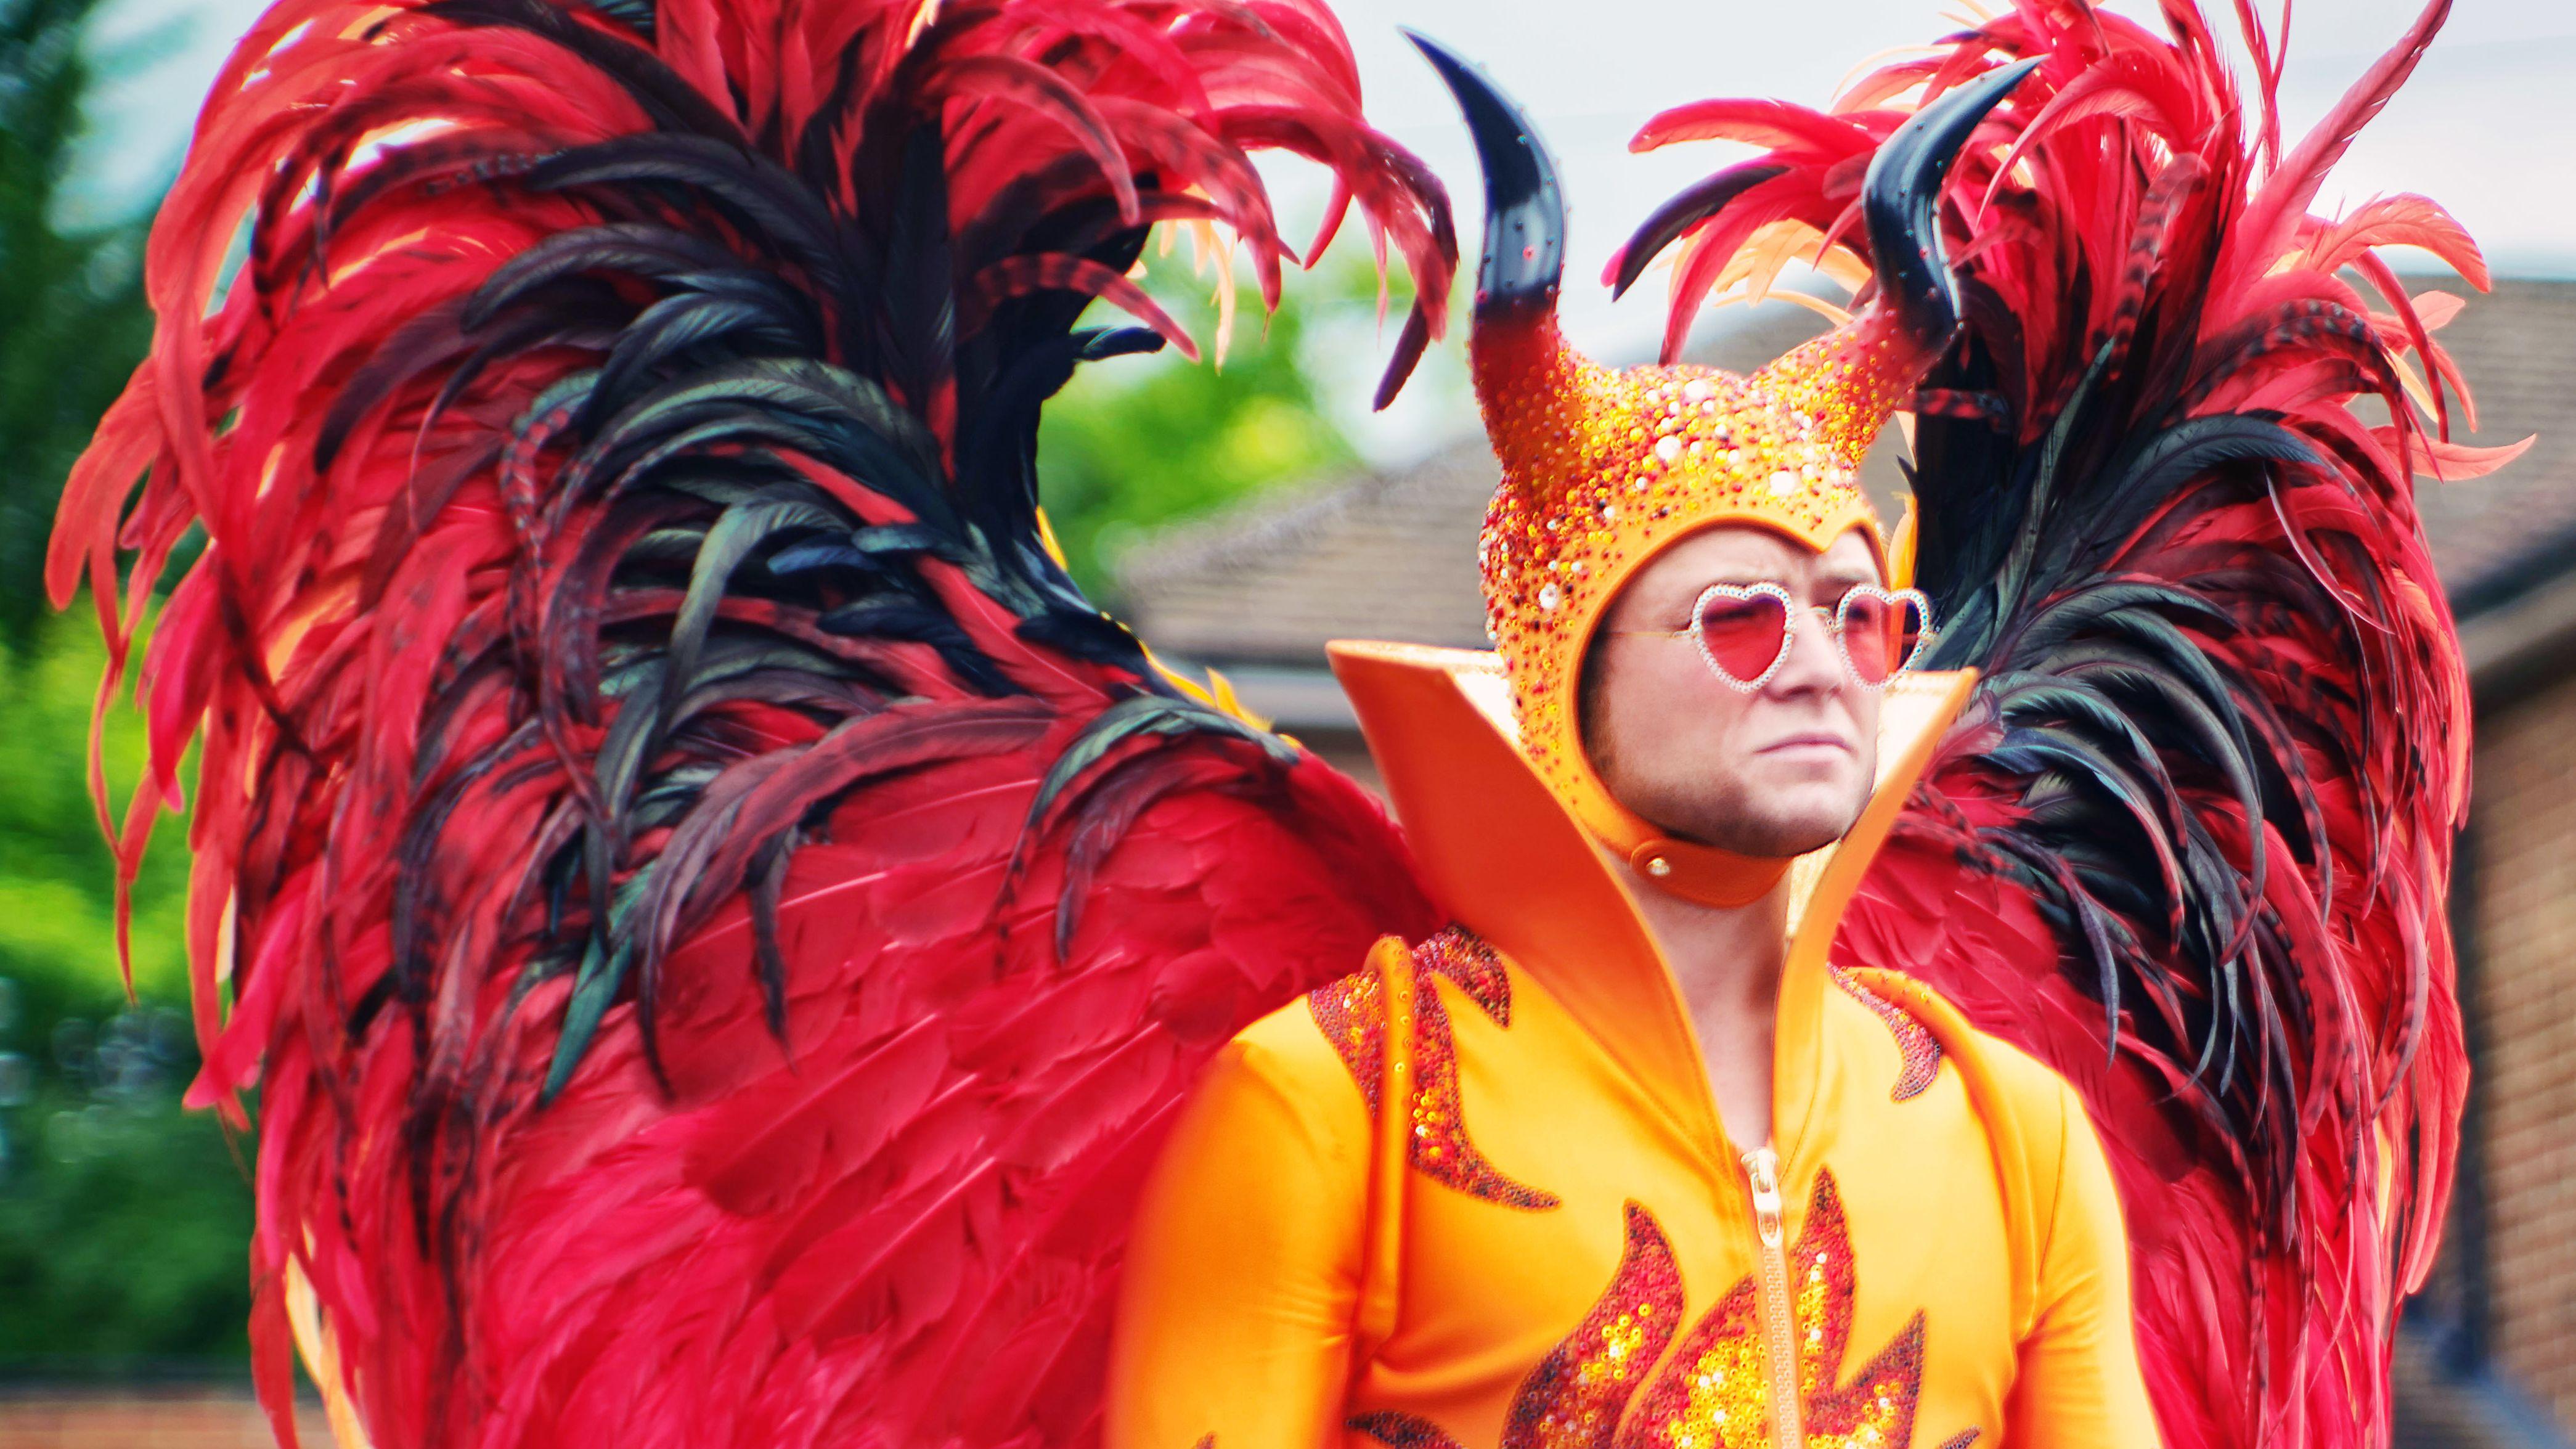 Taron Egerton als Elton John im feuerroten Bühnenkostüm